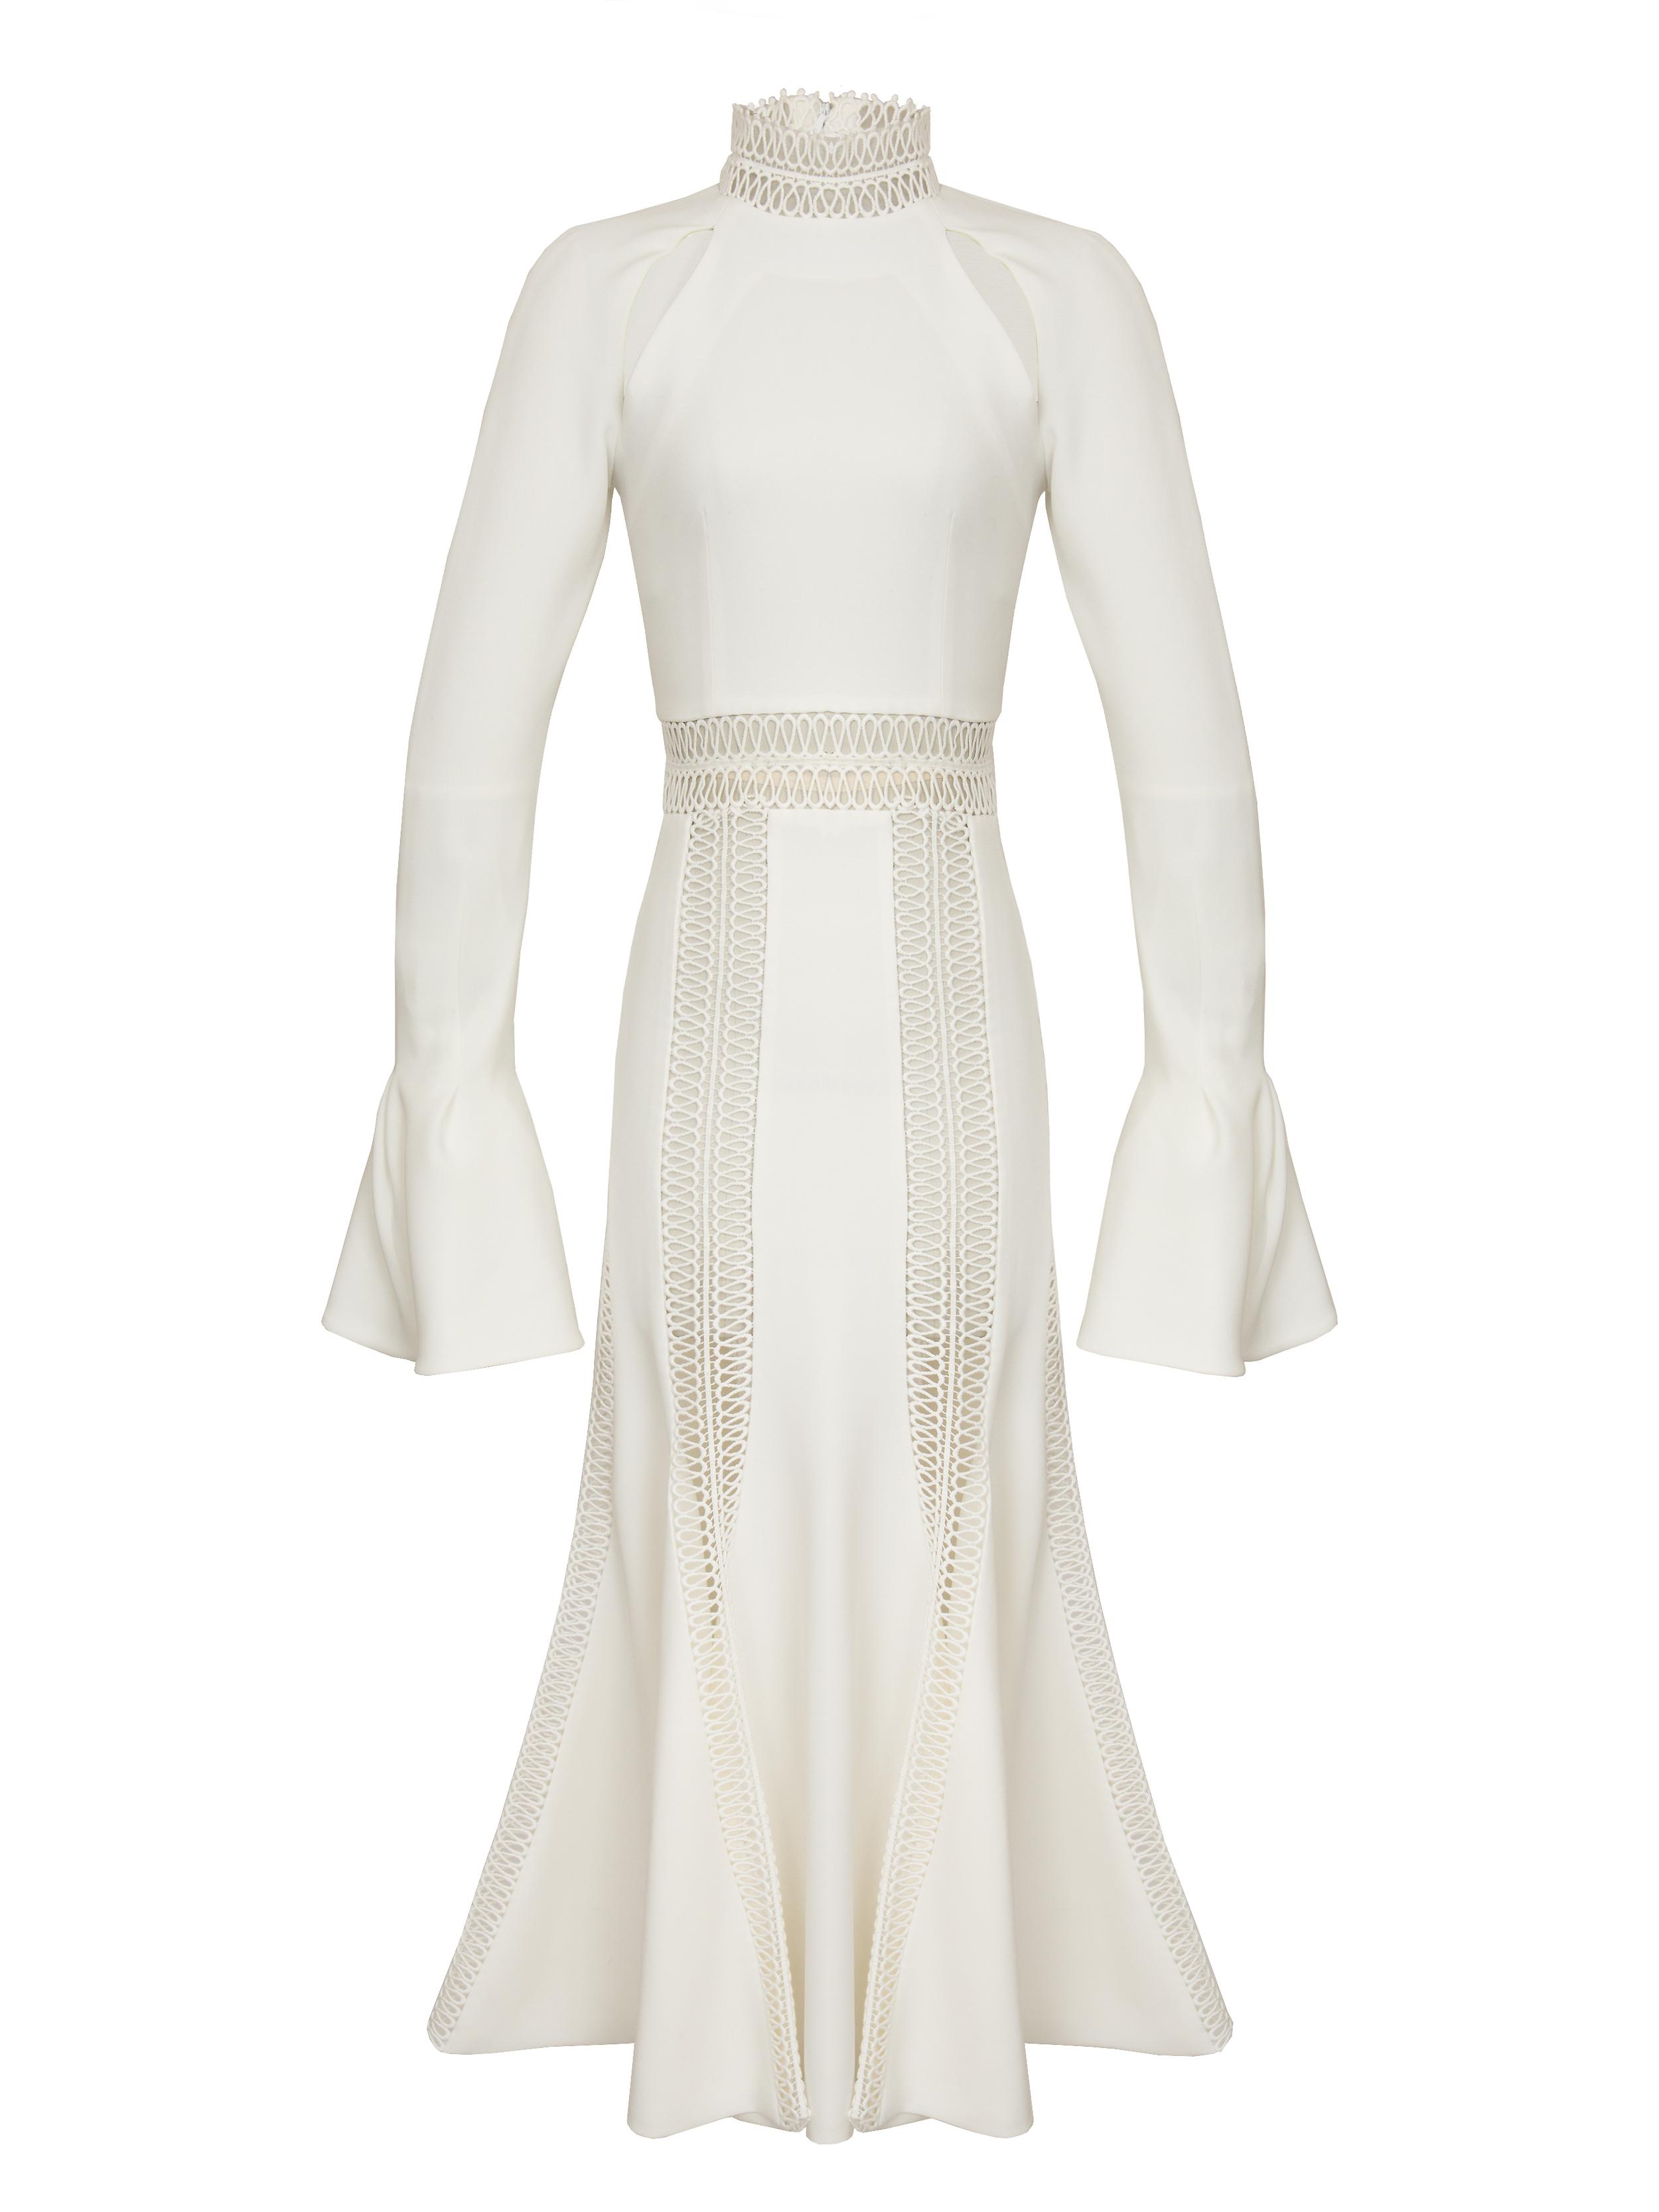 P1227-U, Trumpet Sleeve Trim Dress, Ivory.jpg